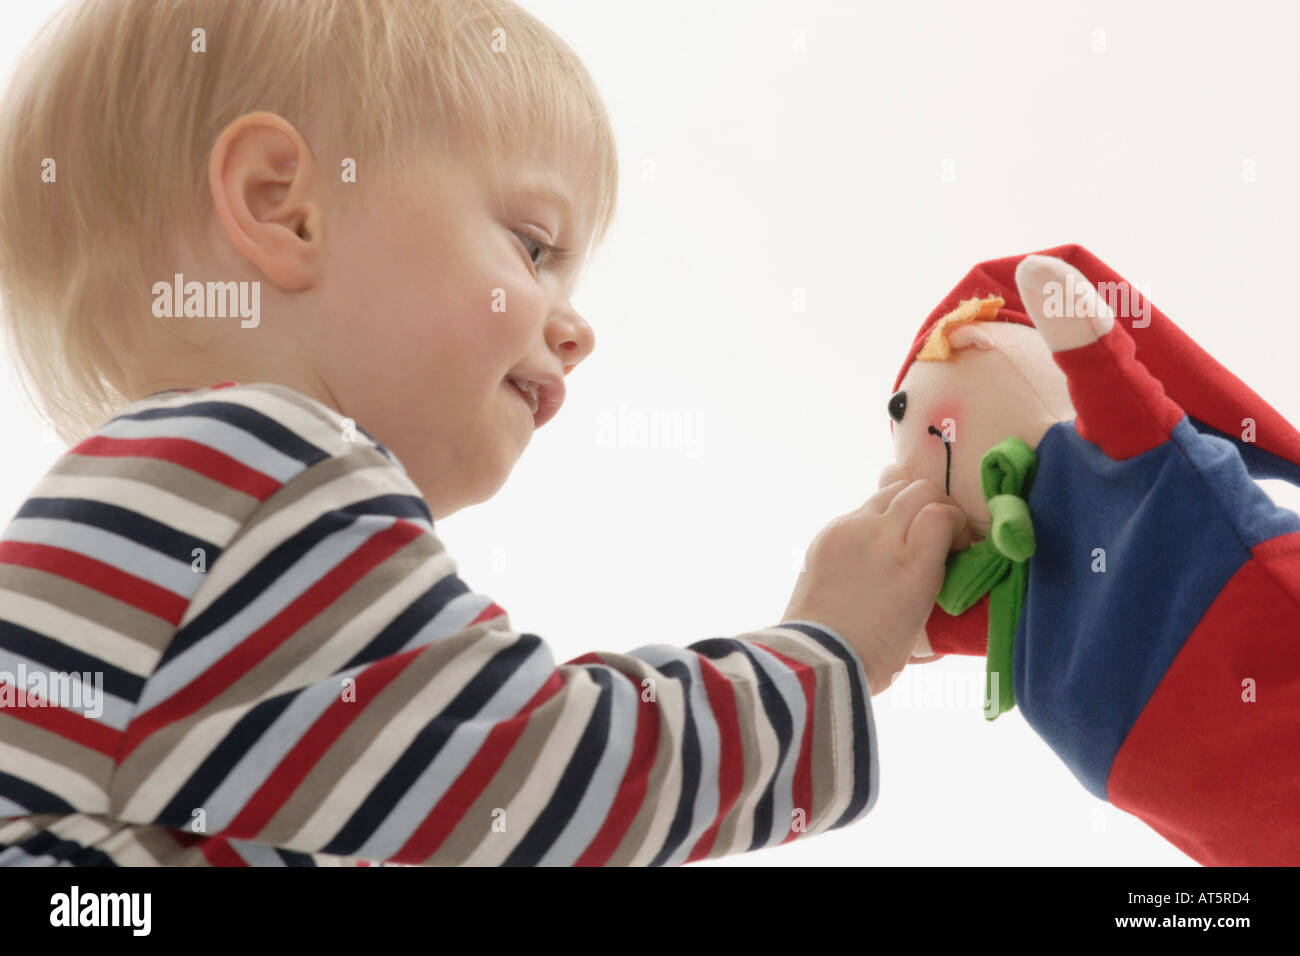 Kind spielt mit Kasperl - Stock Image